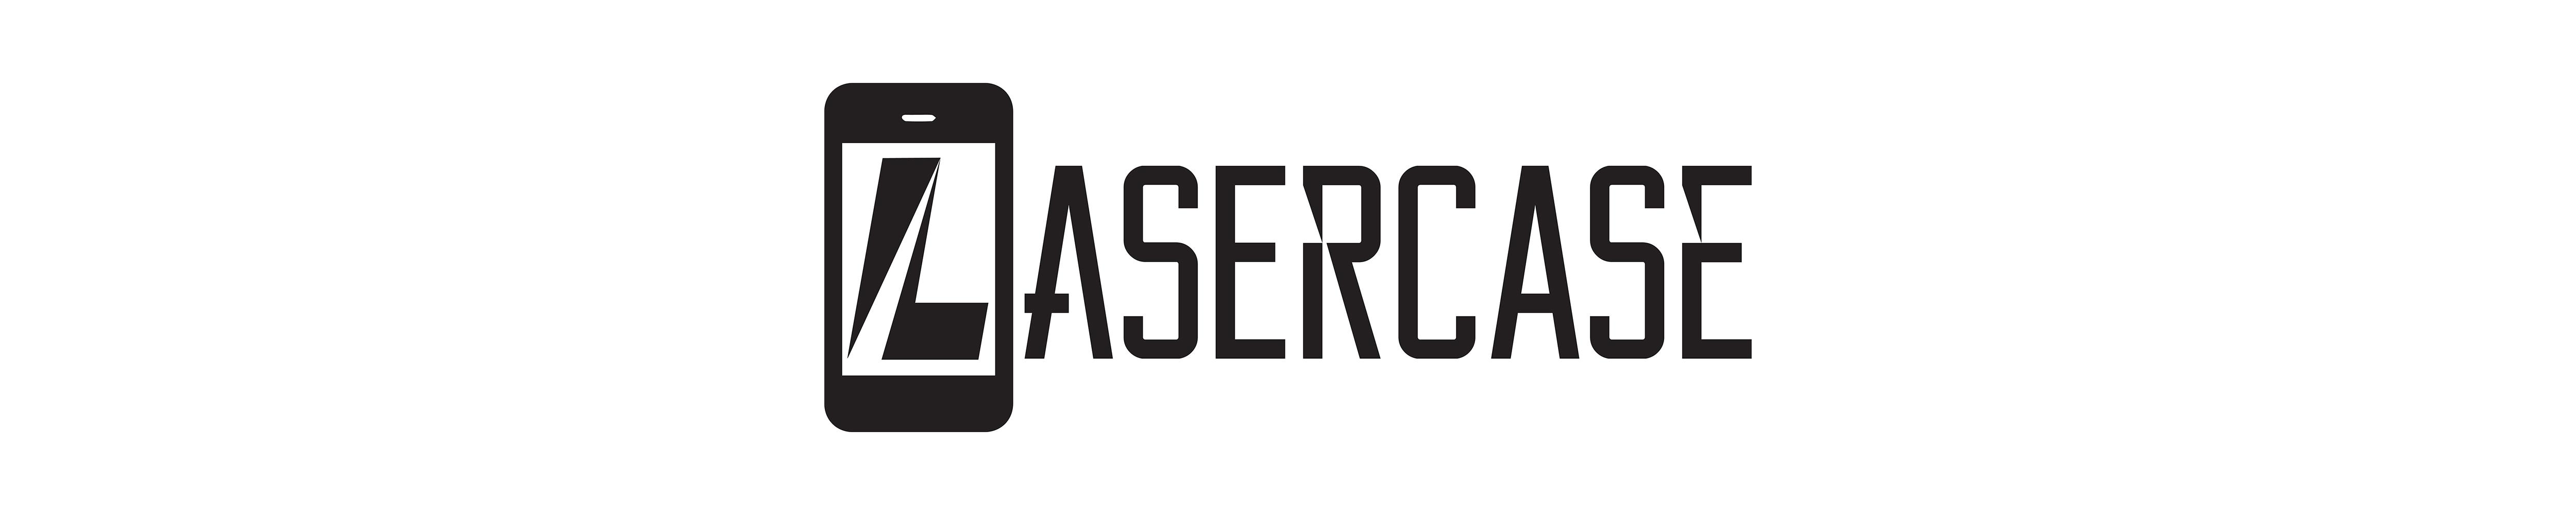 LaserCase